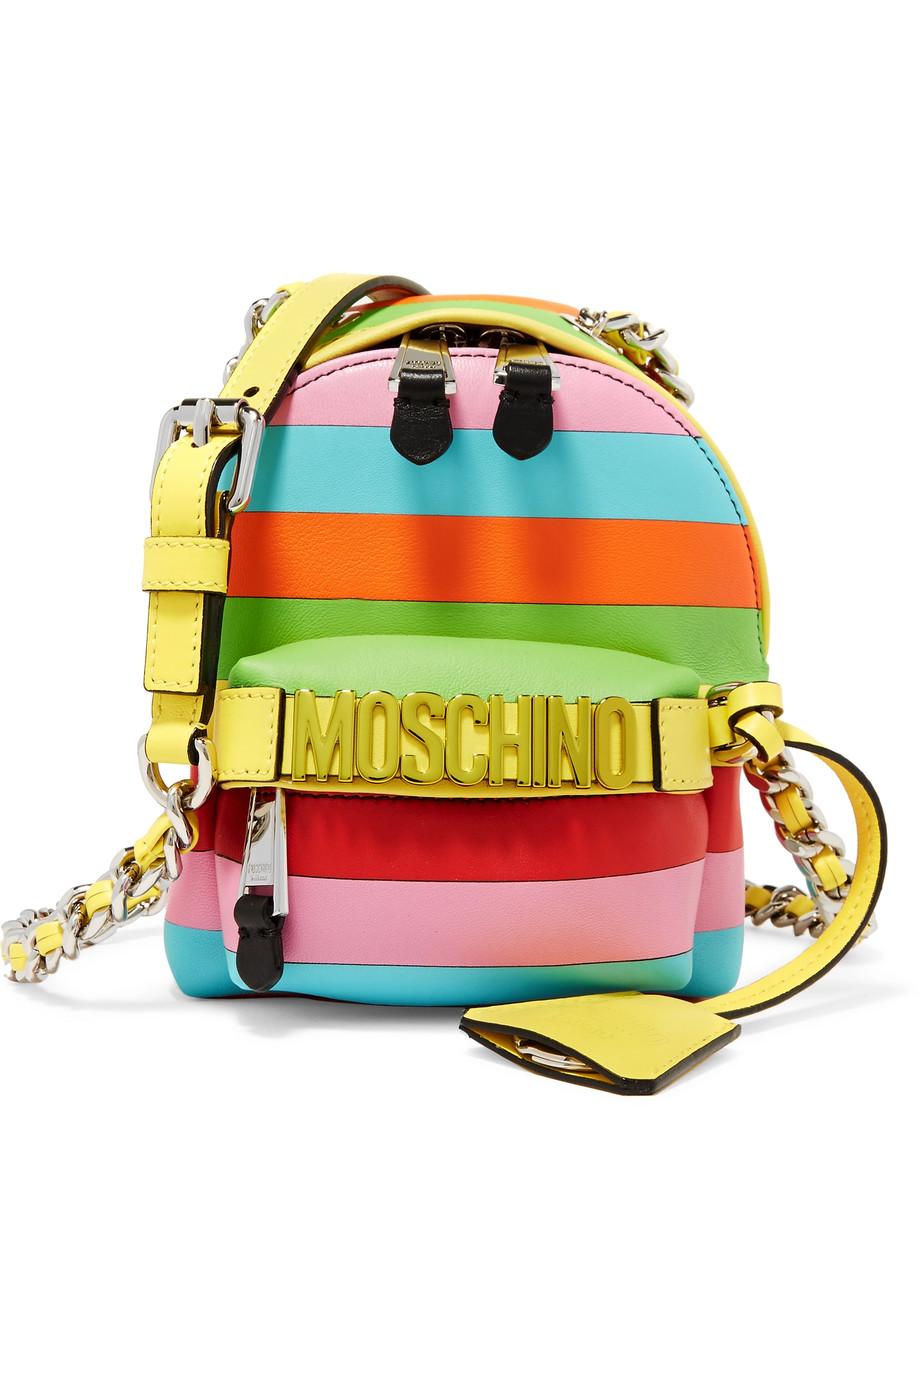 Moschino  Mini Embellished Bag  ($1150)